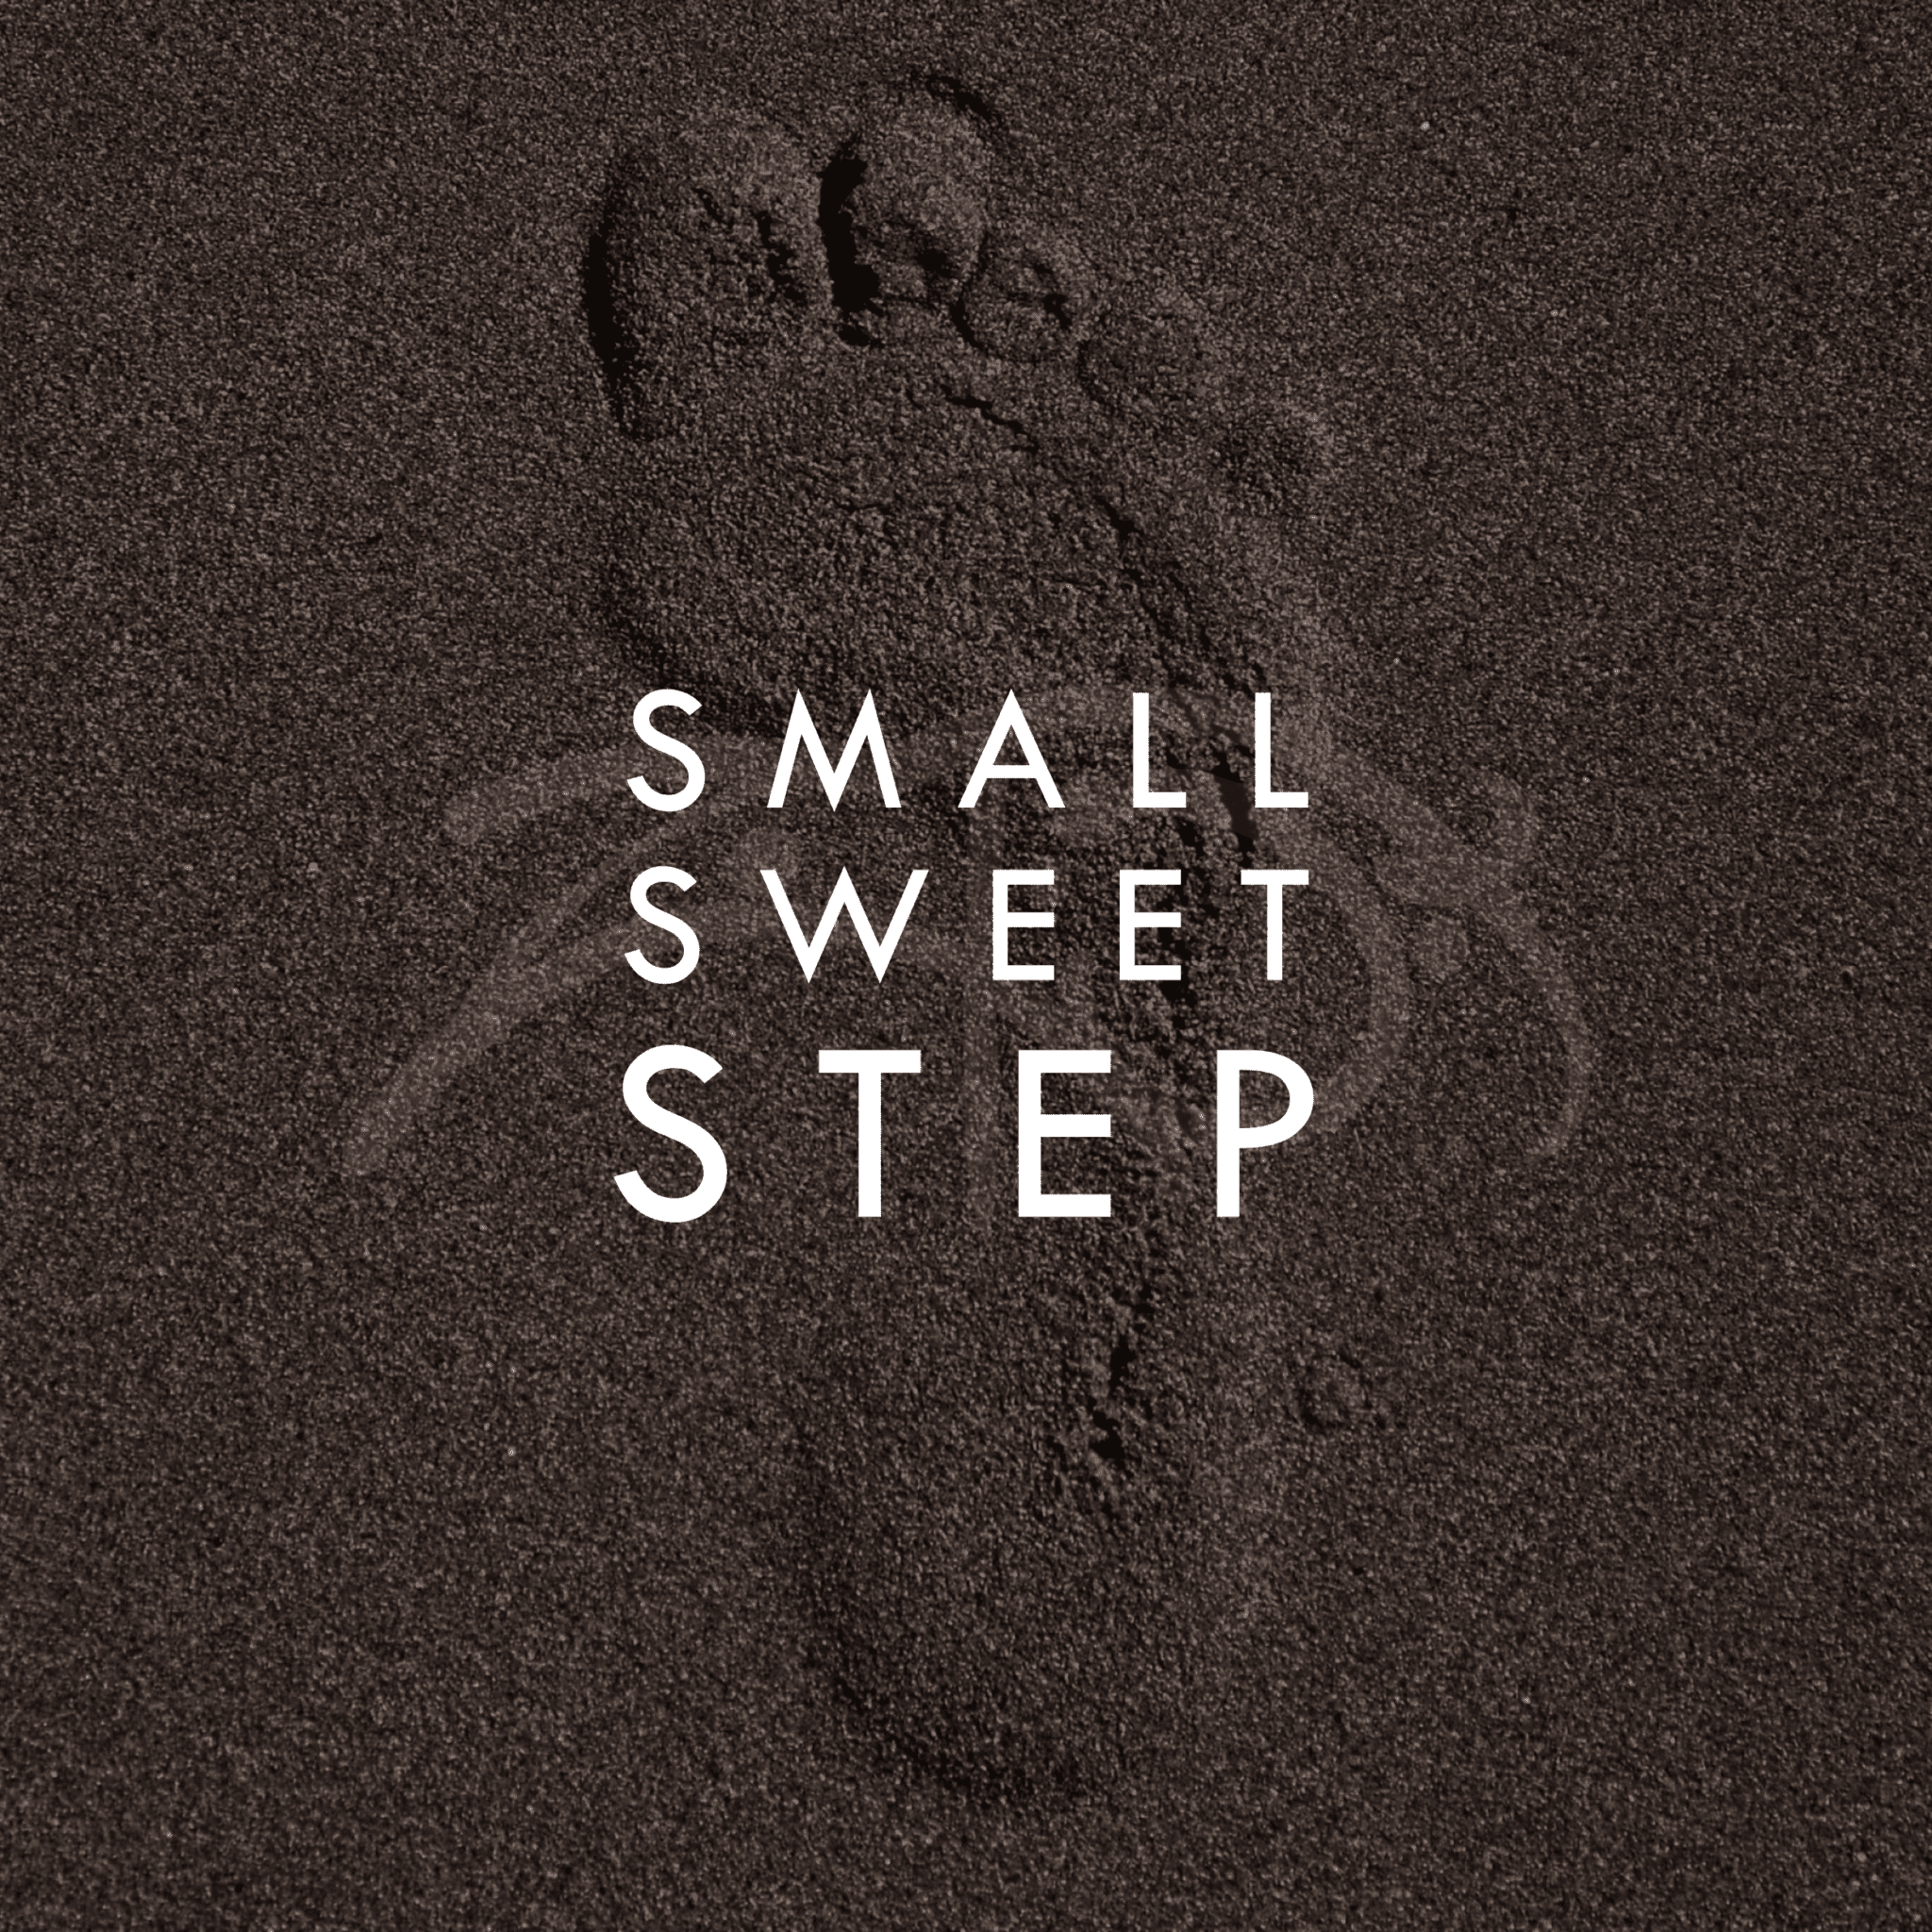 Zo Tobi - Small Sweet Step - Cover Art